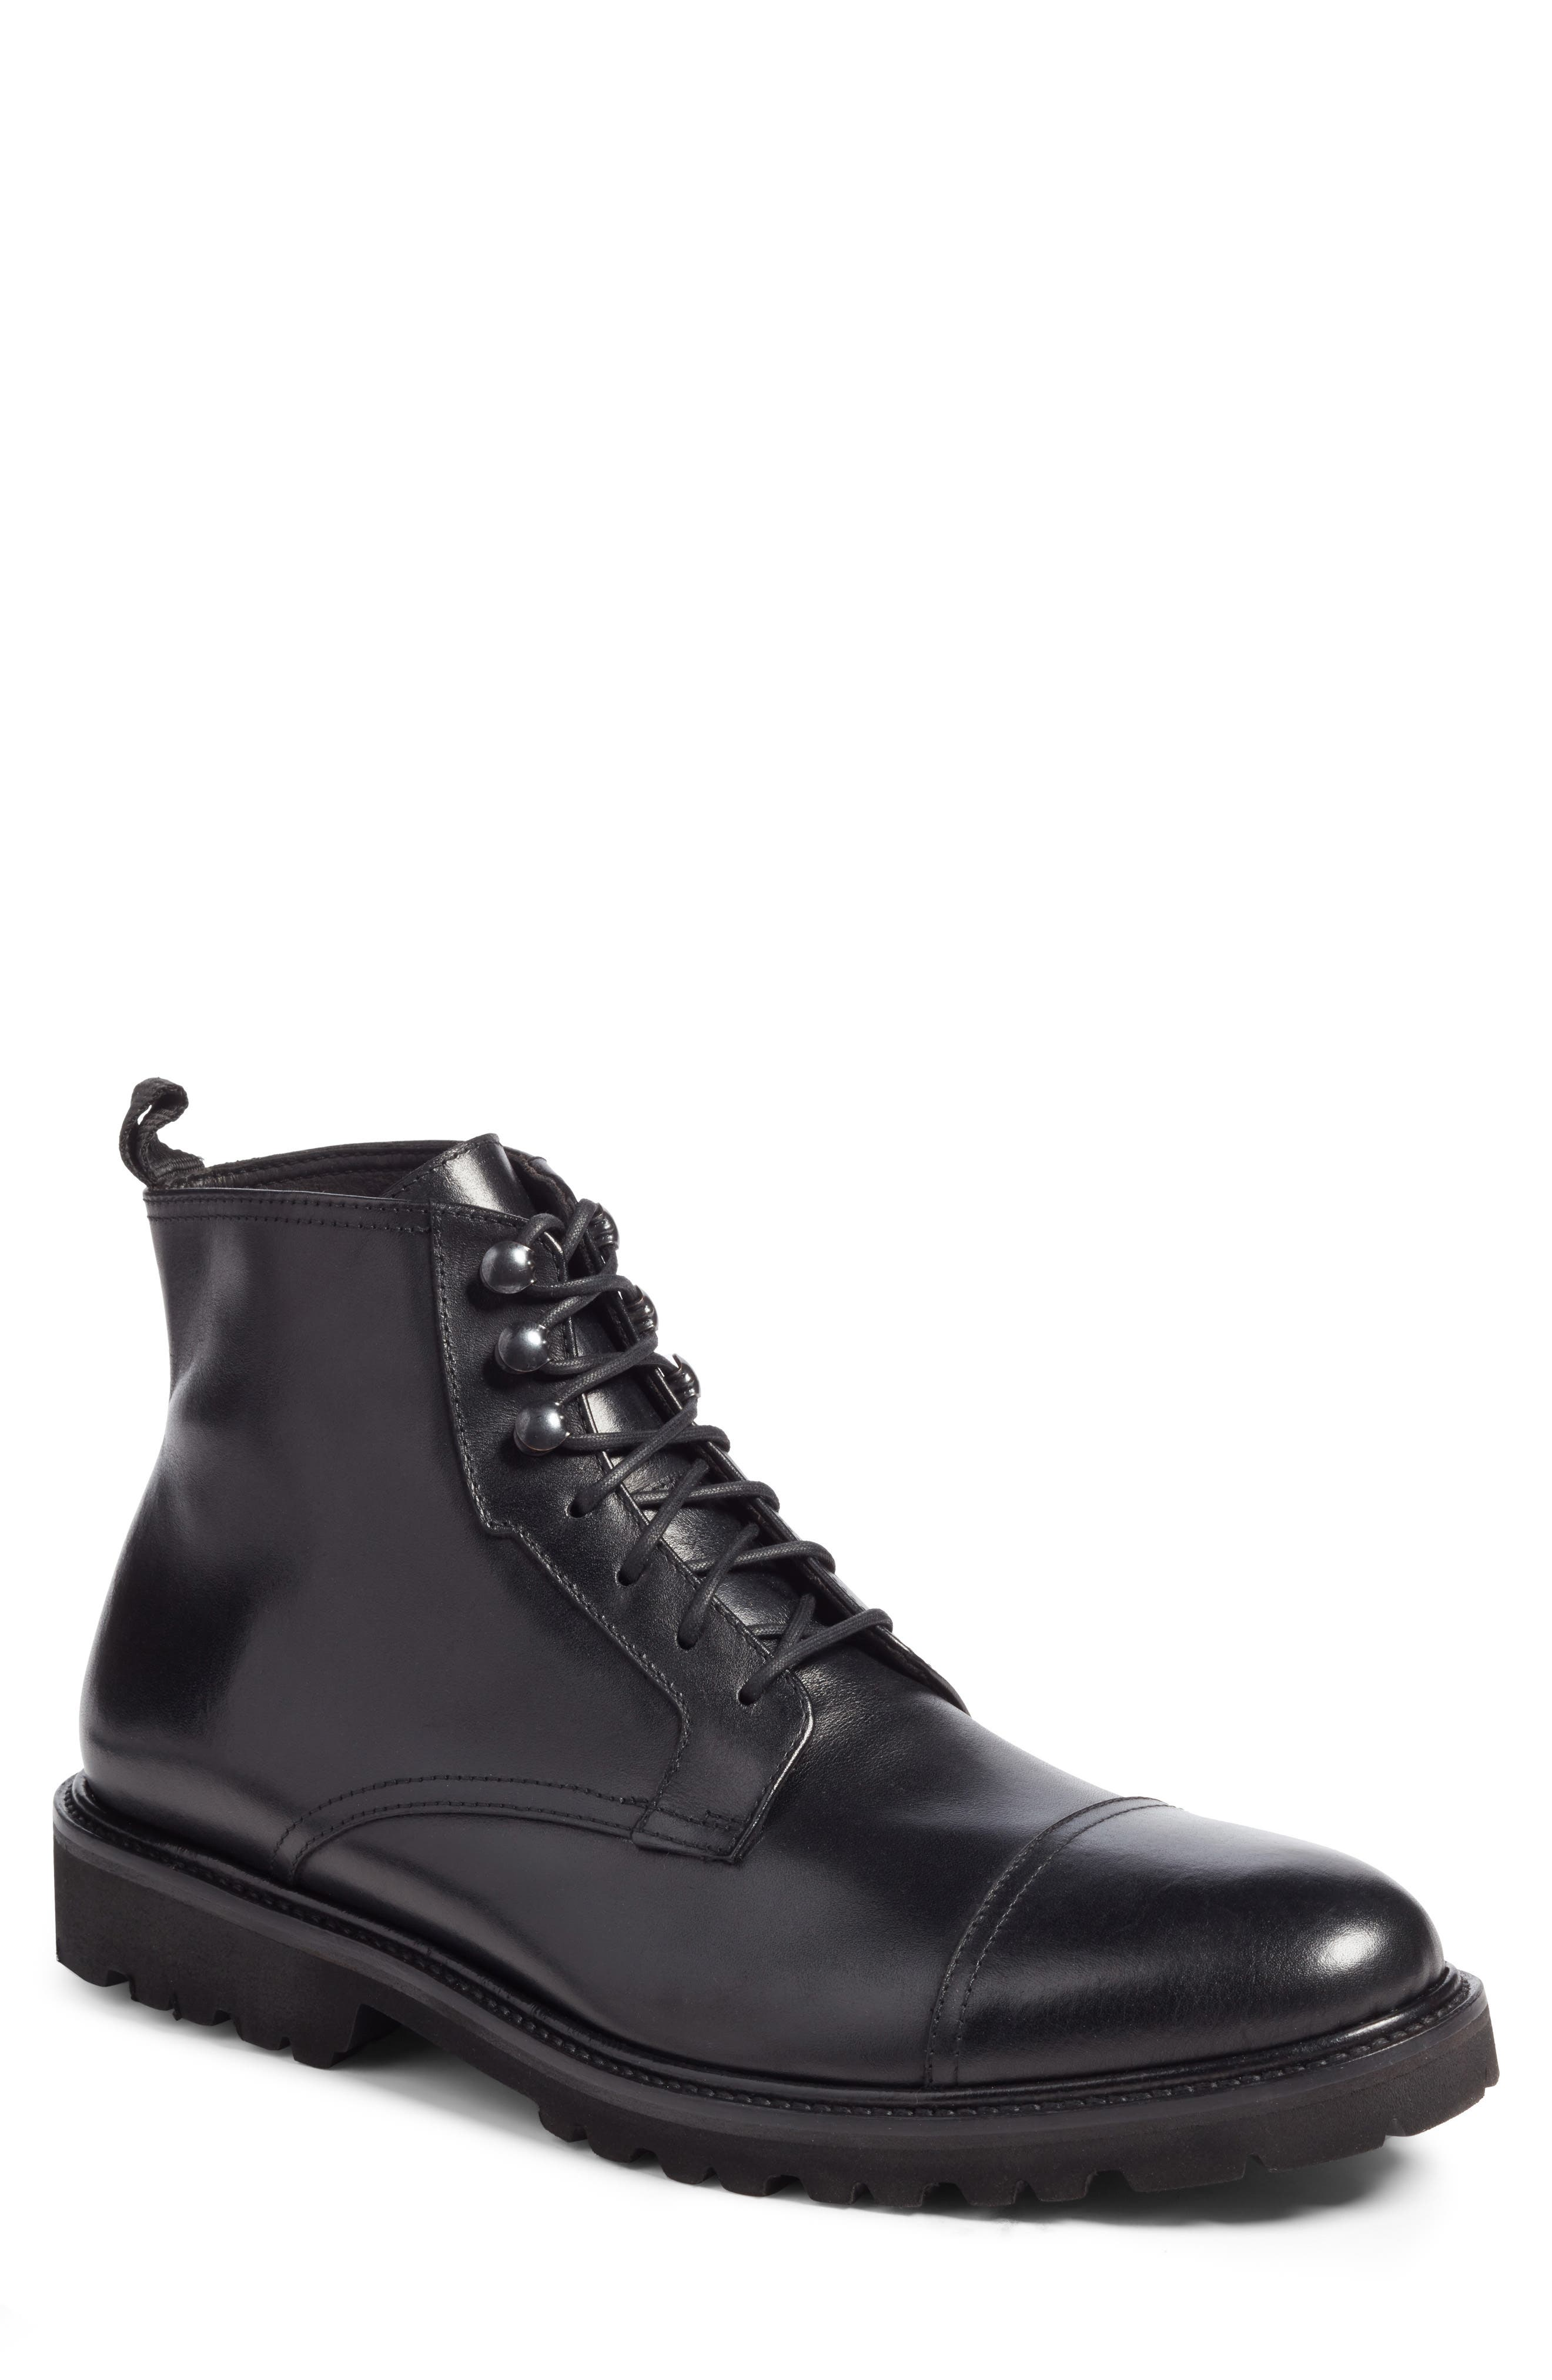 Alternate Image 1 Selected - Monte Rosso Tropea Waterproof Cap Toe Boot (Men)